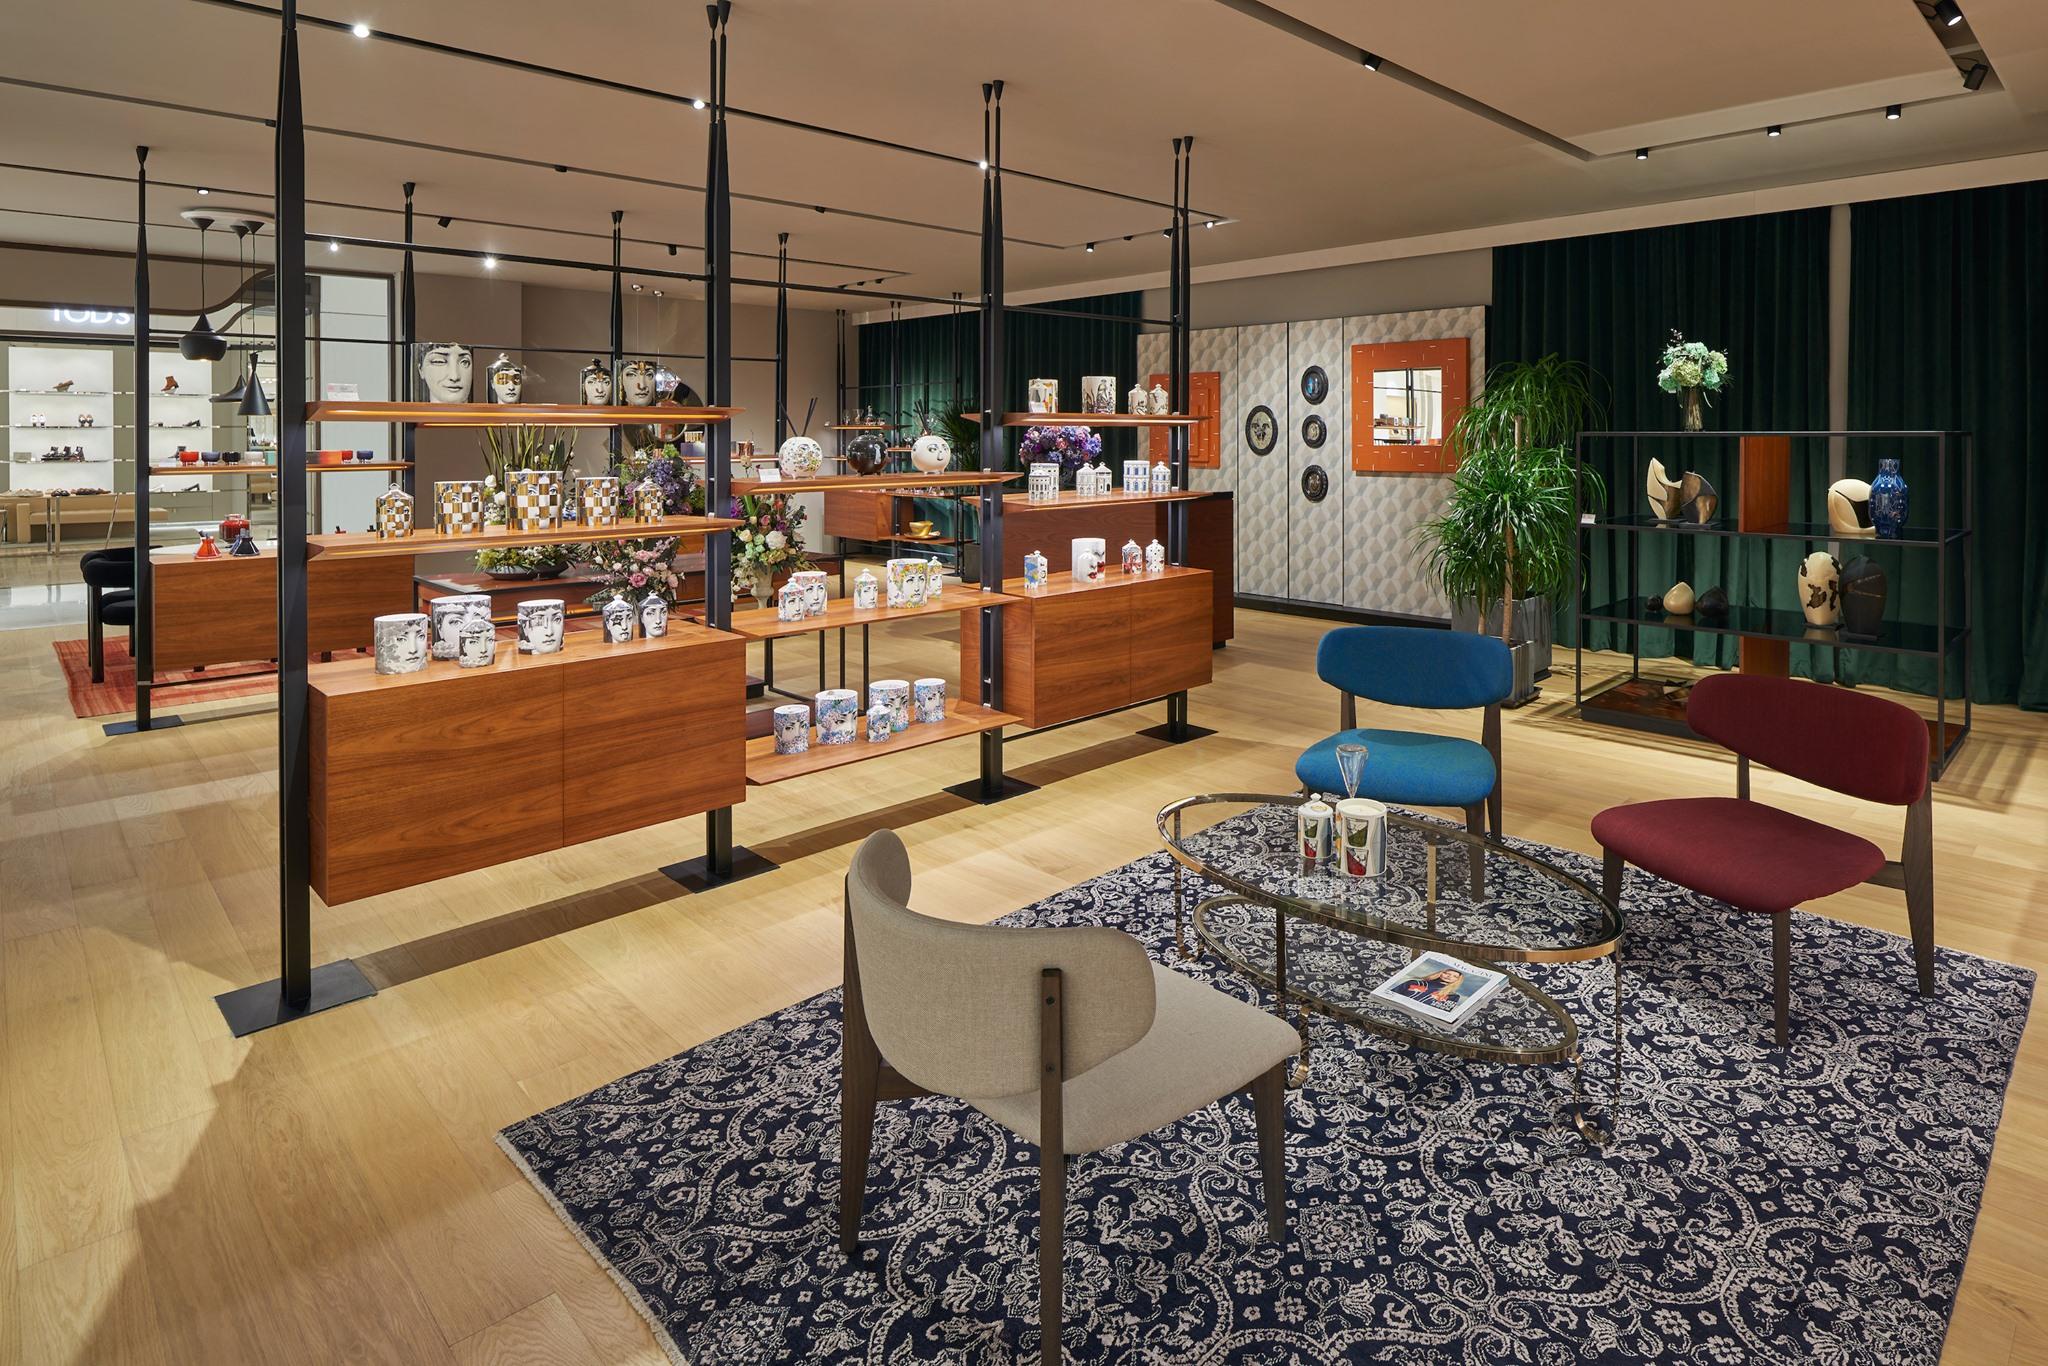 Milan - 20 Most Iconic Interior Design Personalities